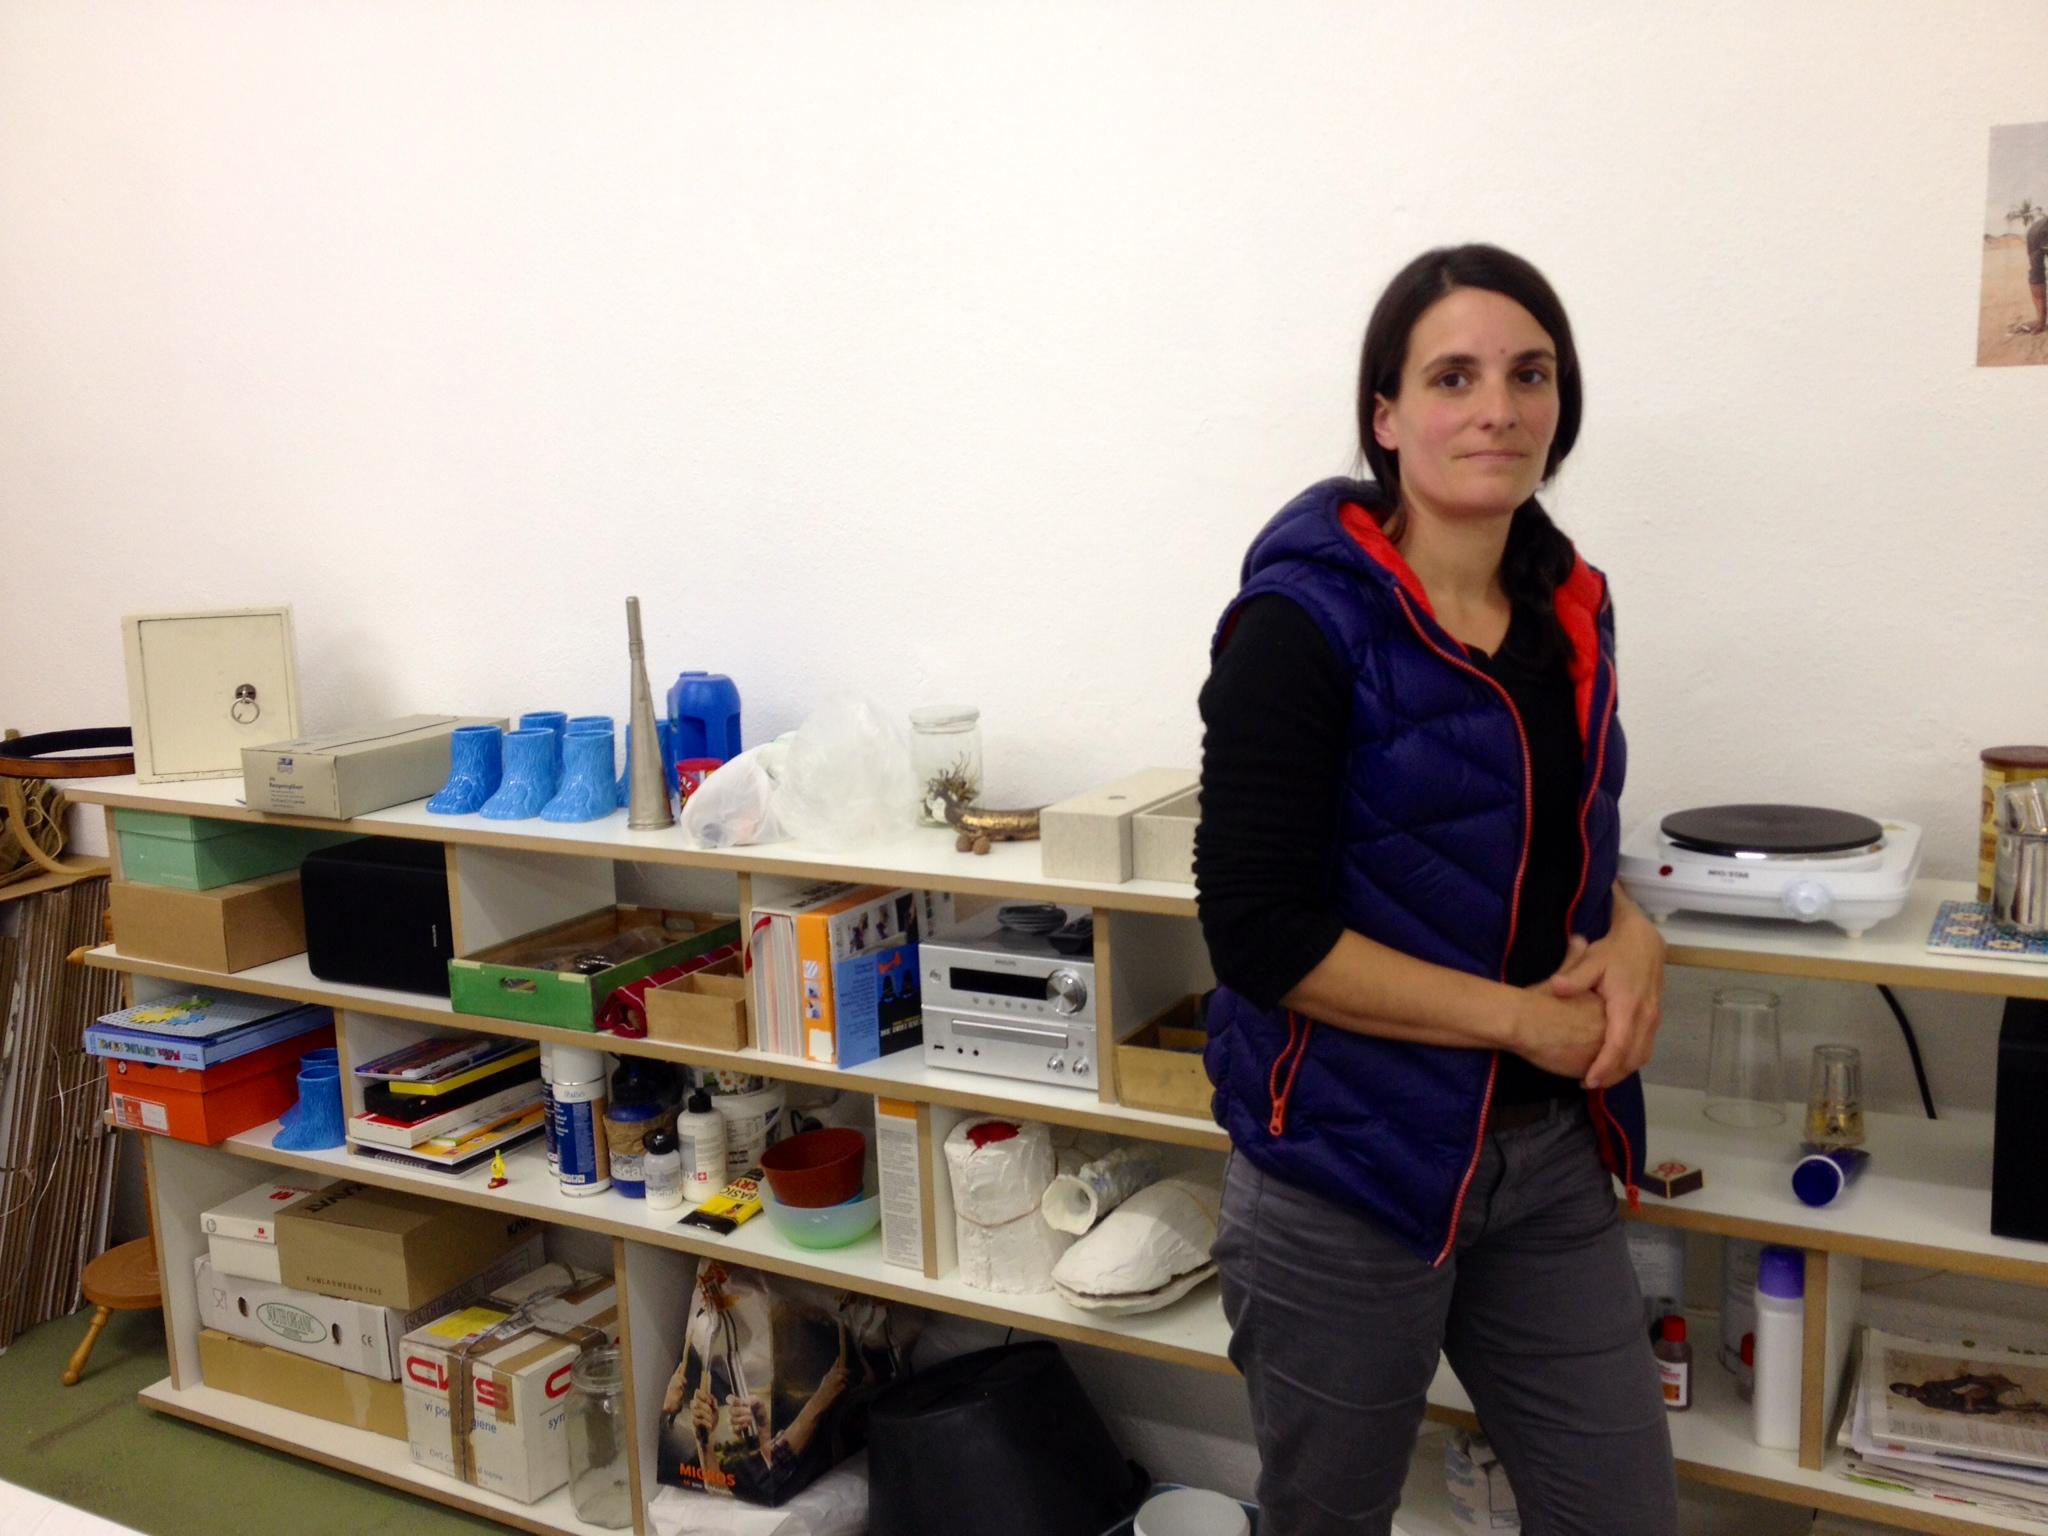 L'artista Notta Caflisch en ses atelier.